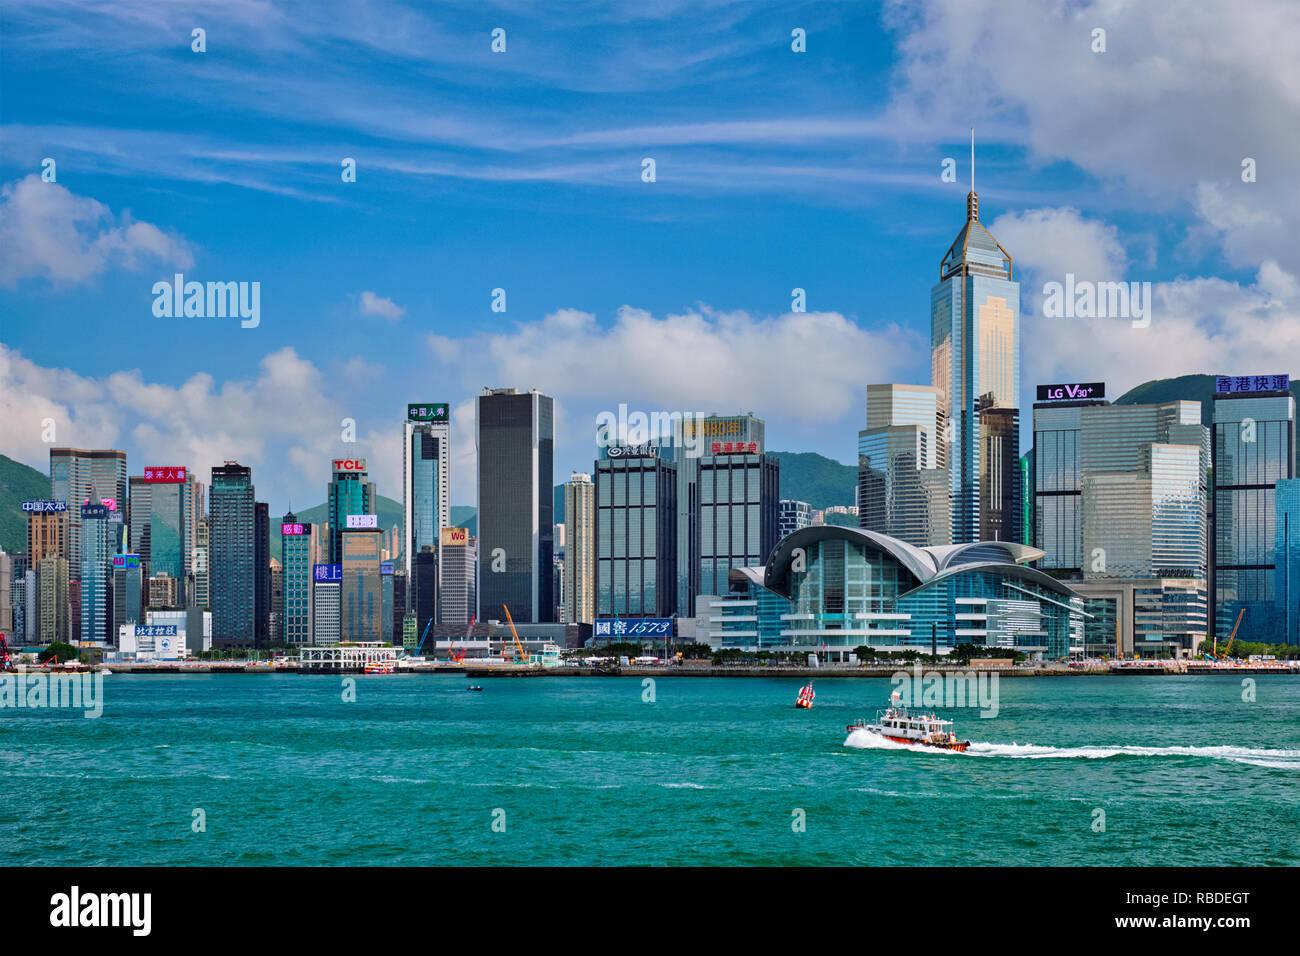 Skyline di Hong Kong. Hong Kong, Cina Immagini Stock